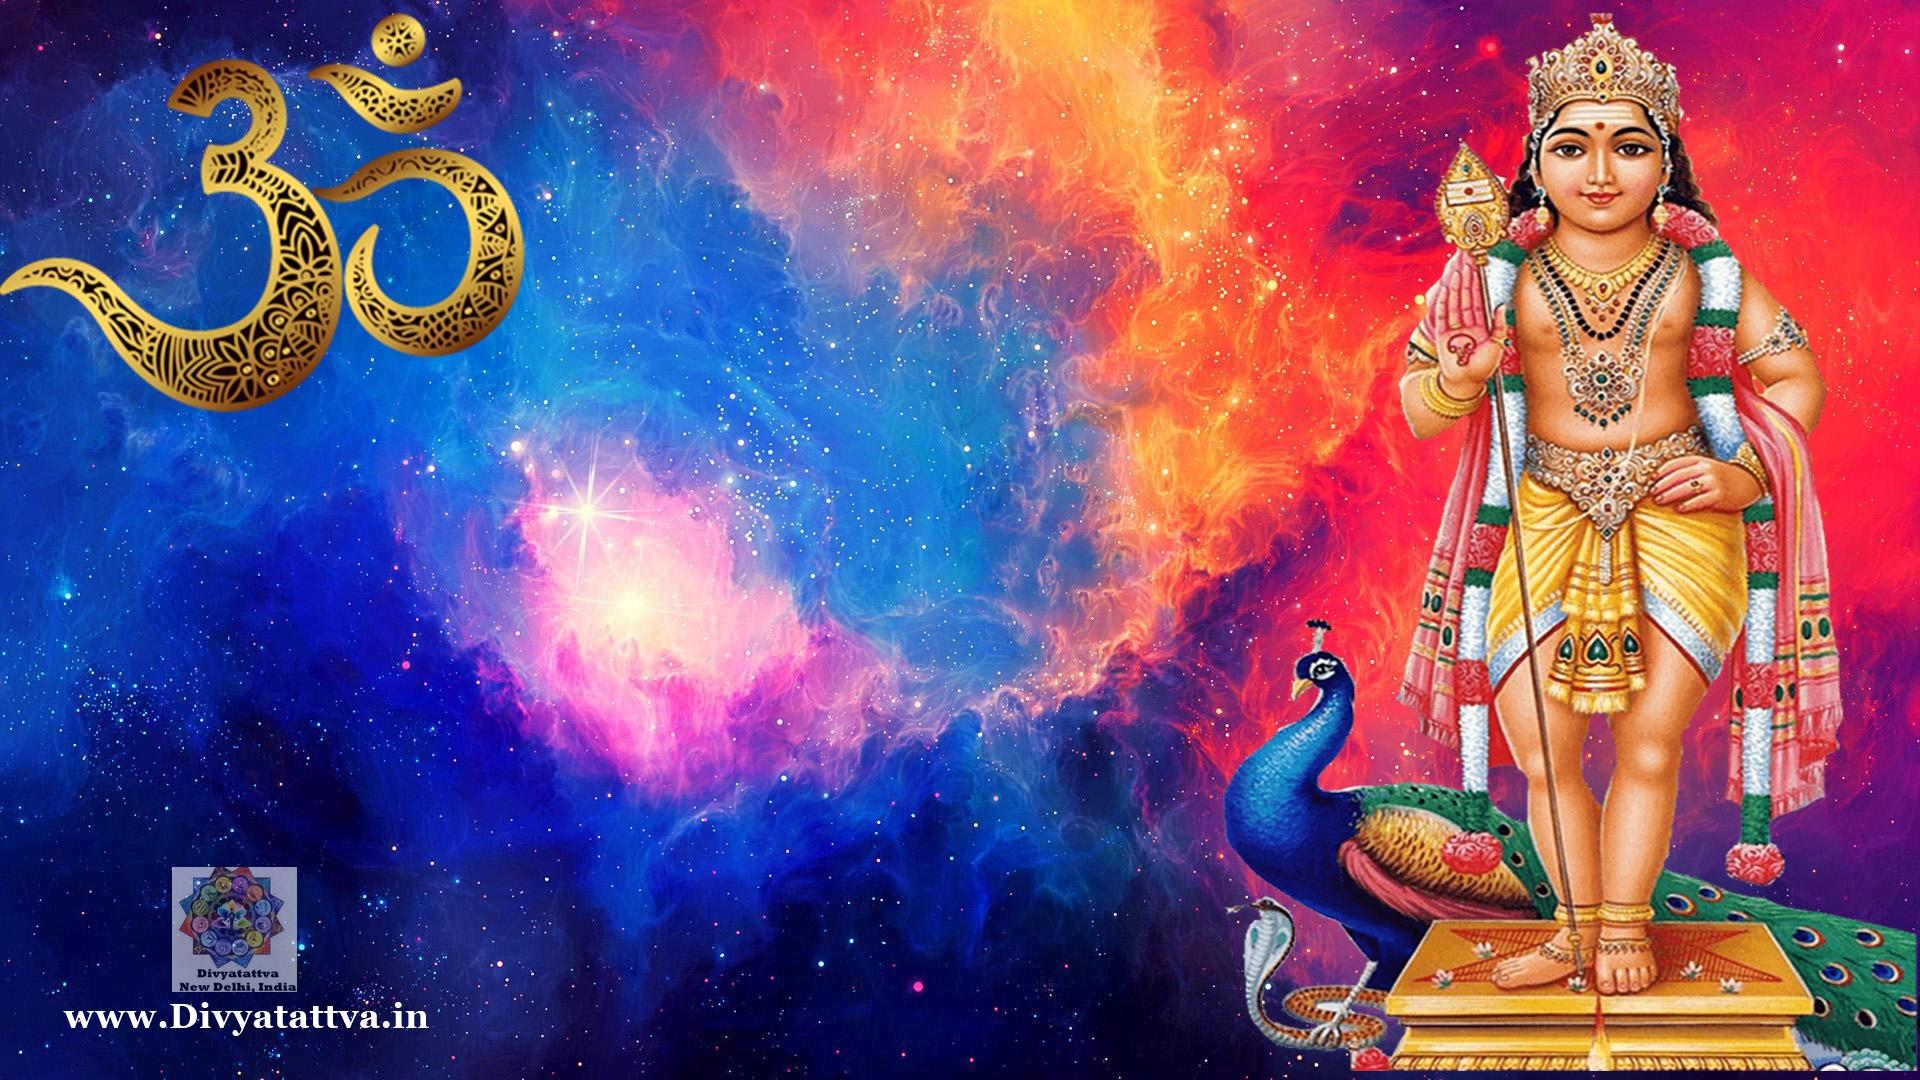 Hindu God Muruga, Kartikeya, Subrahmanya 4k HD Wallpapers & Backgrounds Murugan, Skanda, Kumara, and Subrahmanya is a god of war